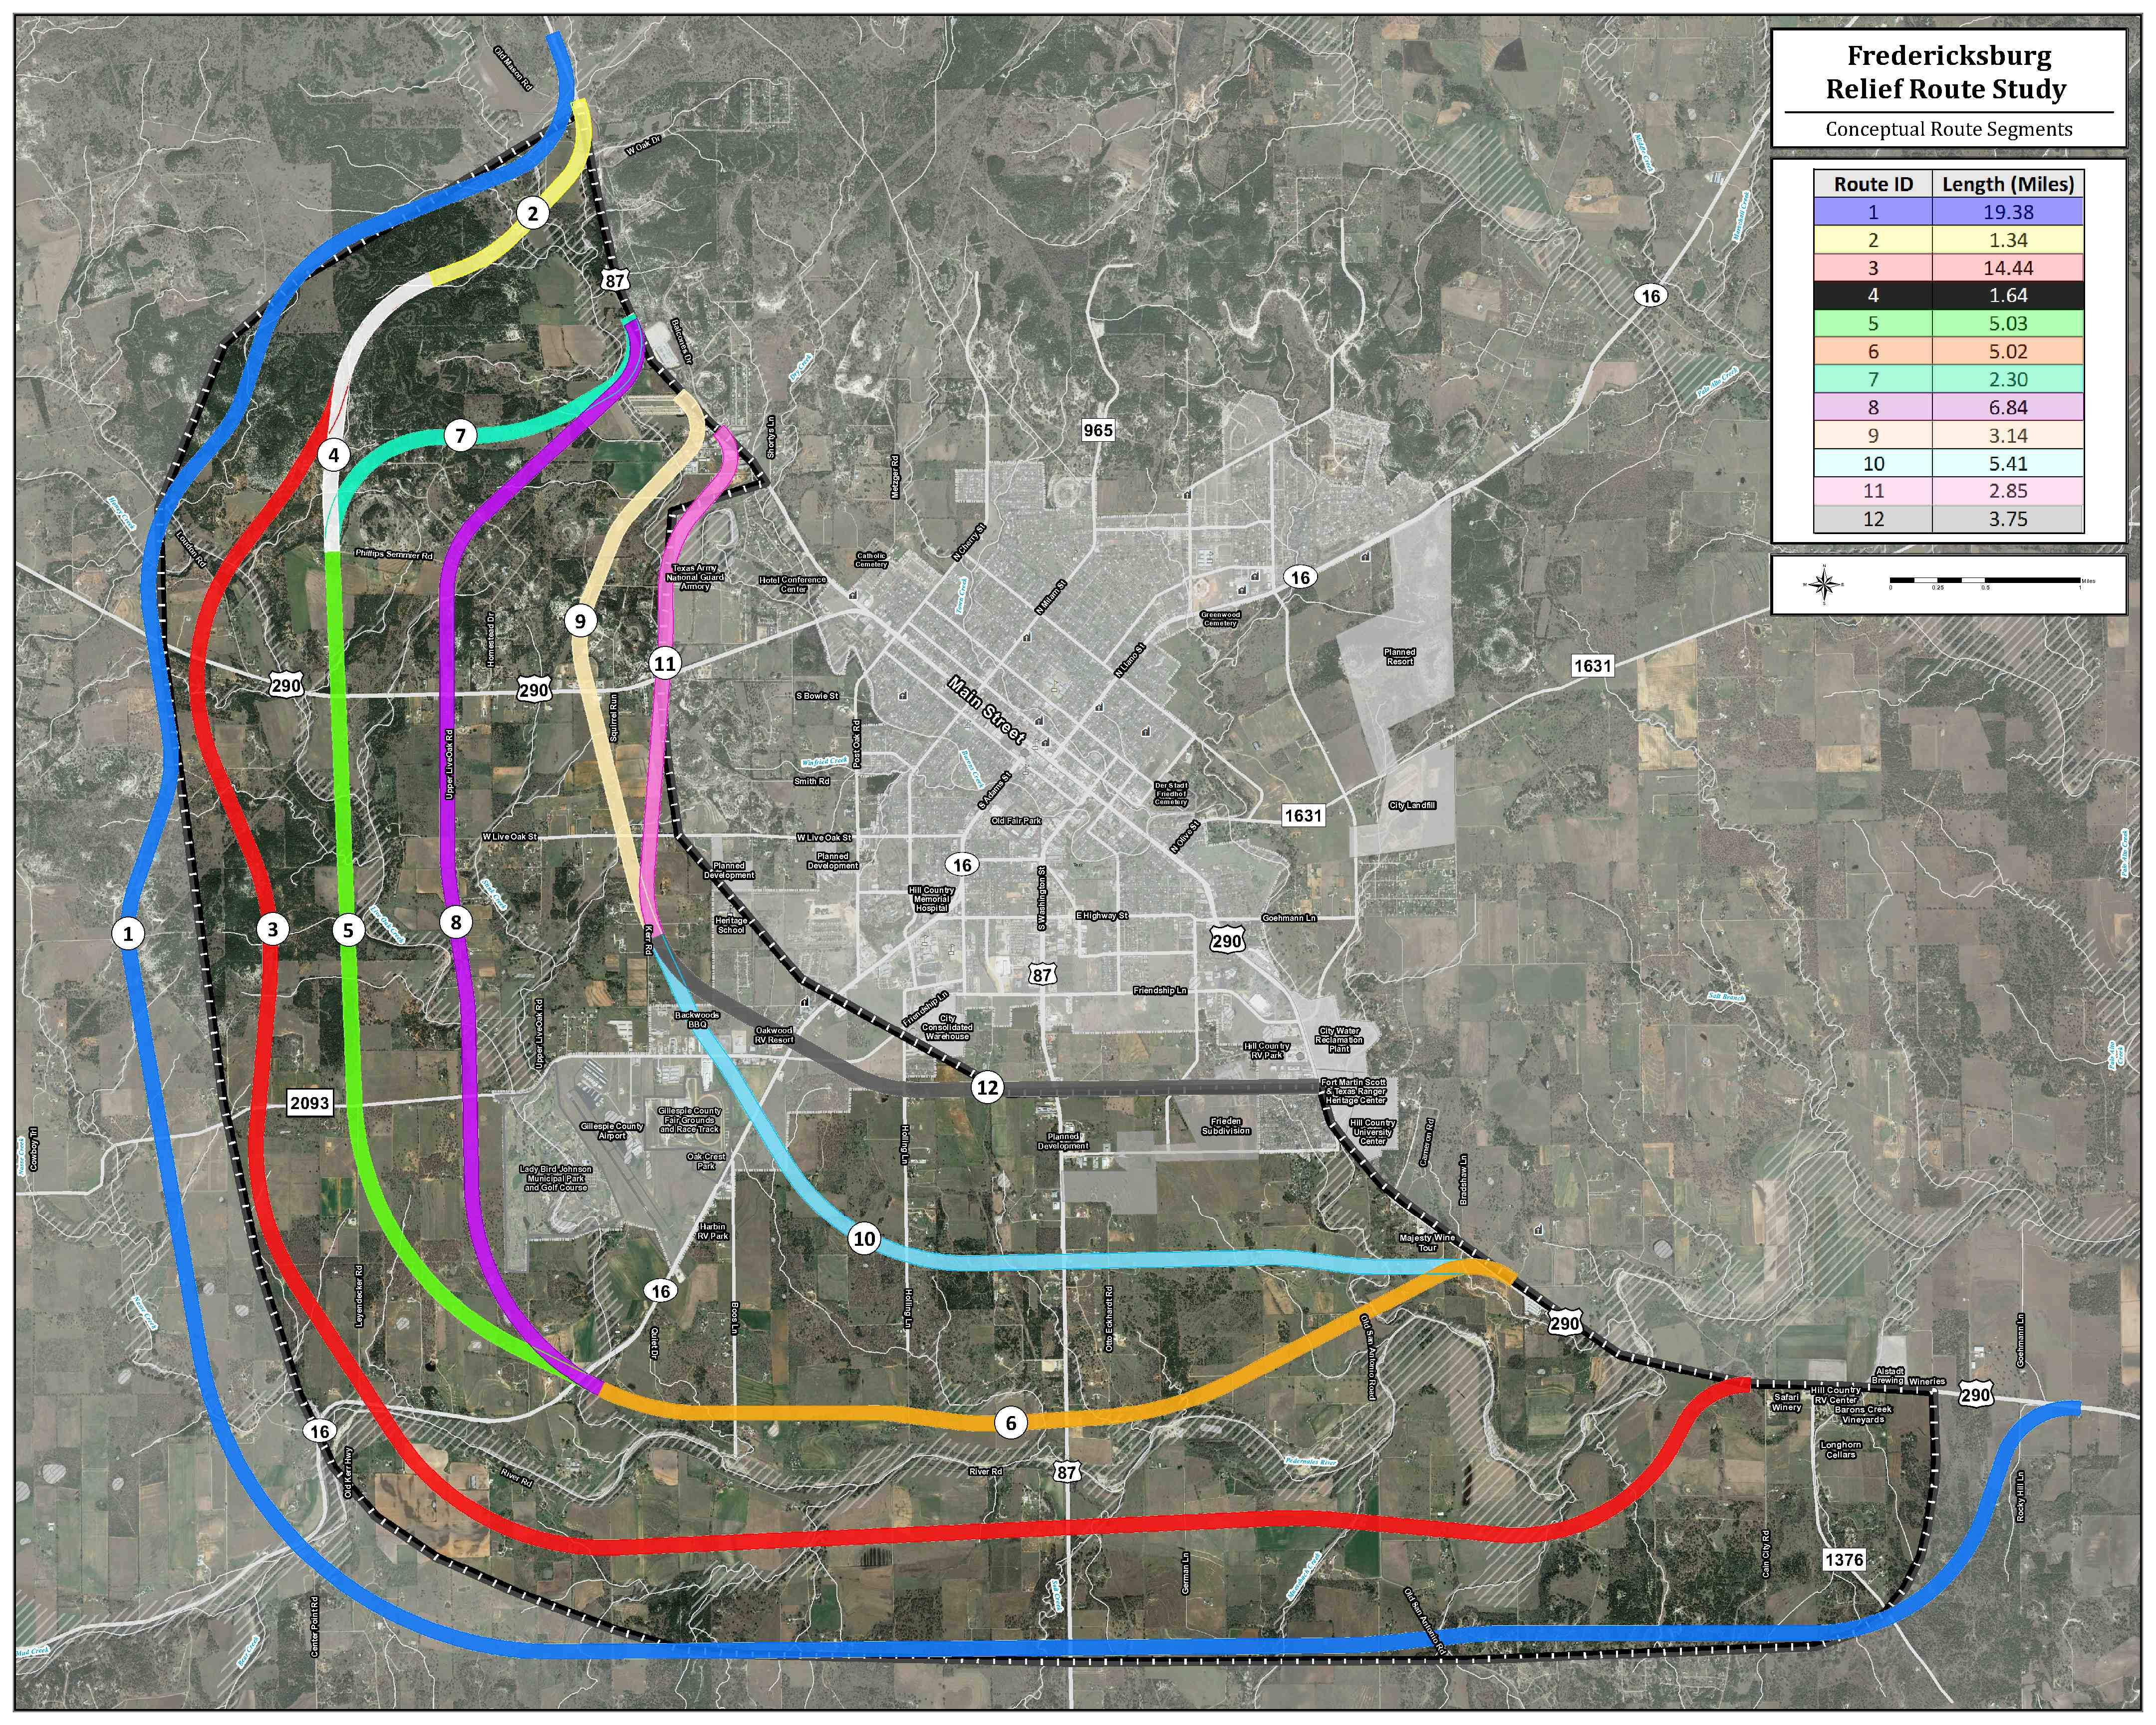 Fredericksburg TX Relief Route